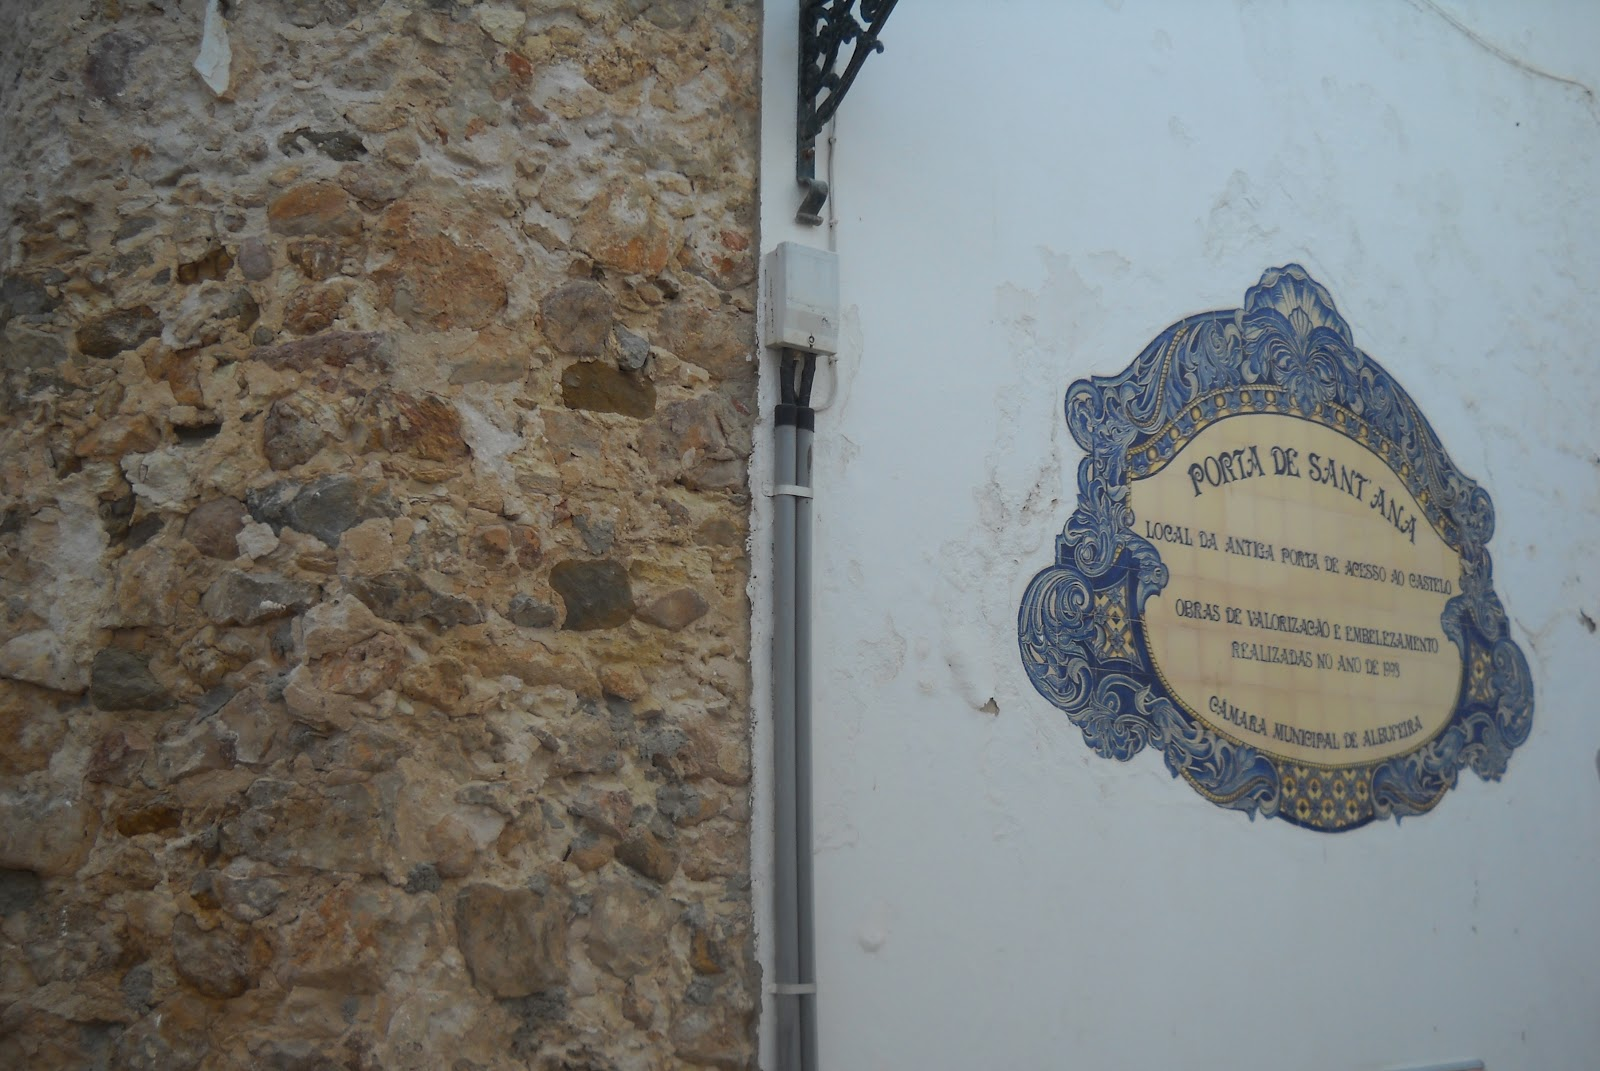 Porta de SantAna